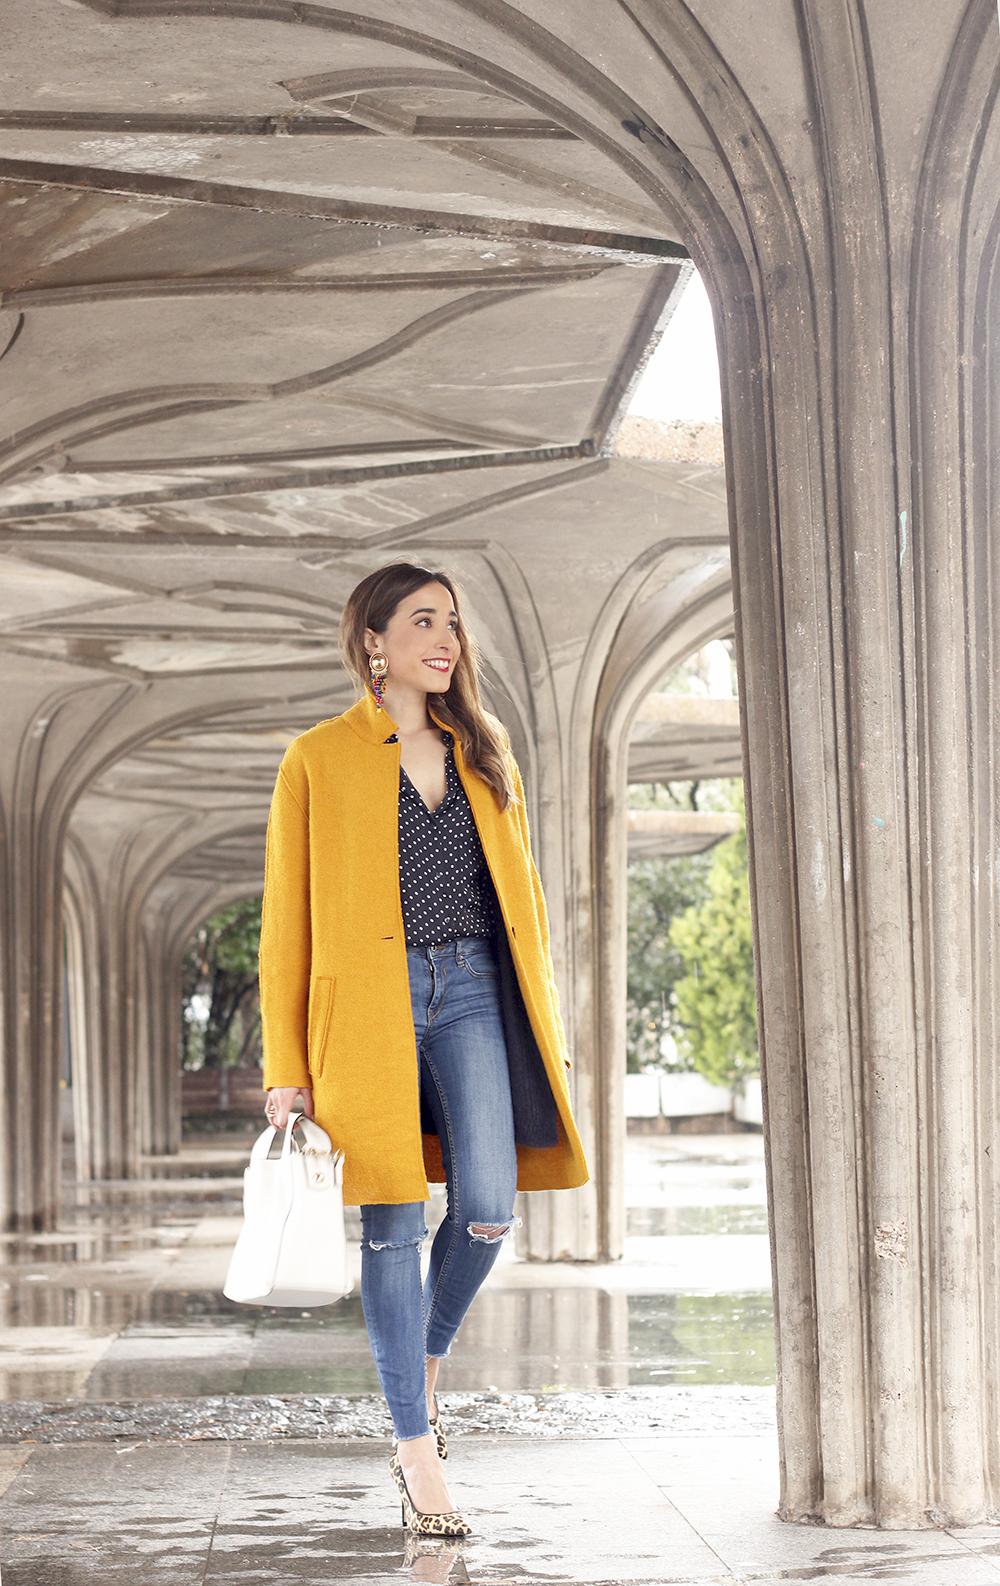 mustard coat polka dots shirt leopard heels white bag outfit 02